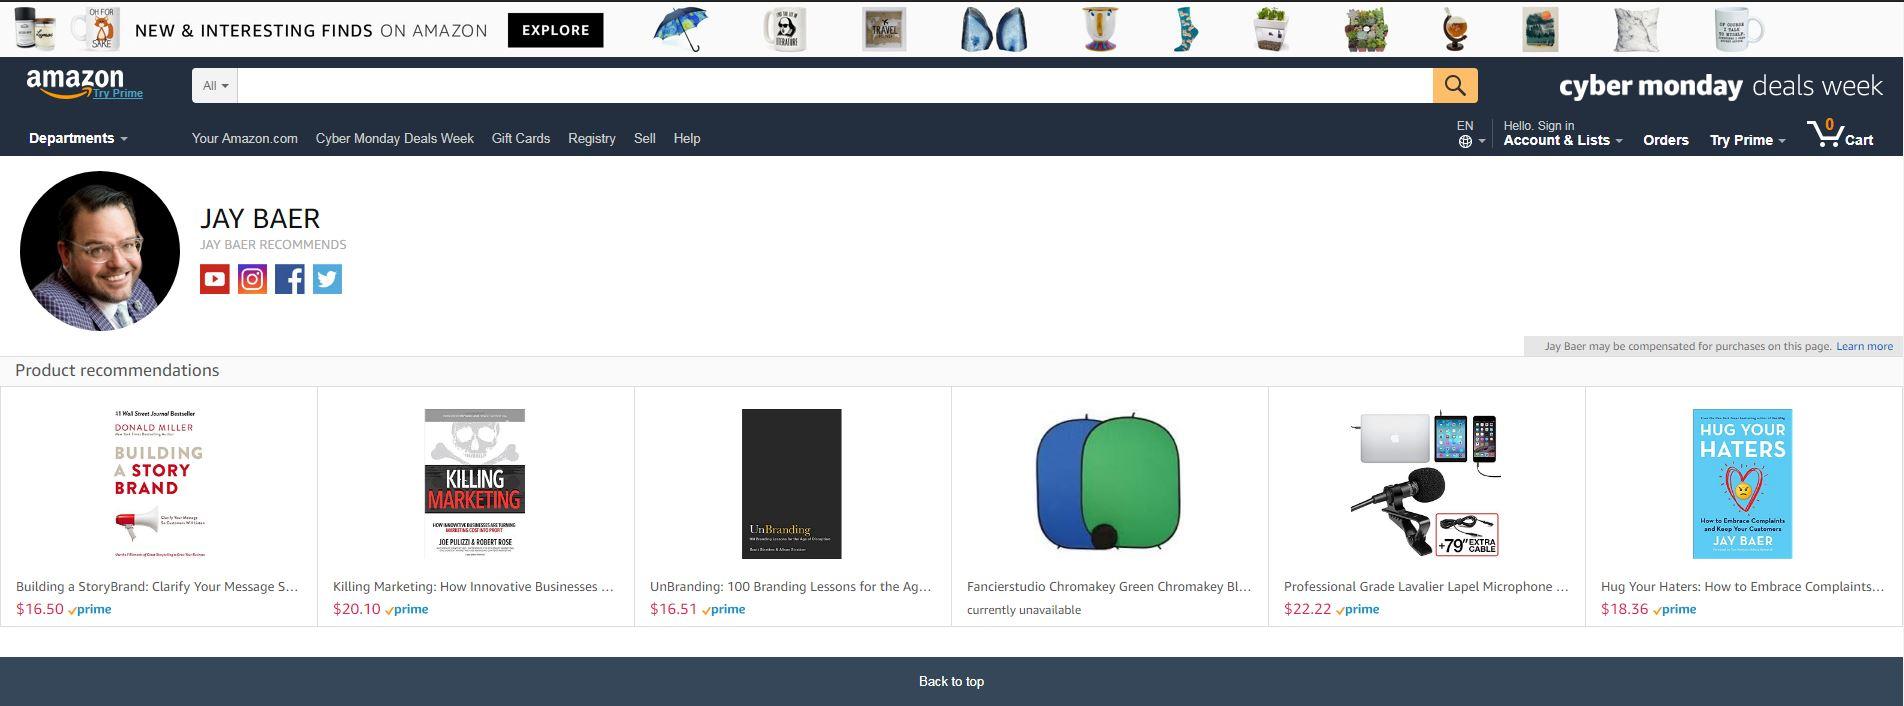 Example of Amazon's Influencer Marketing Storefront